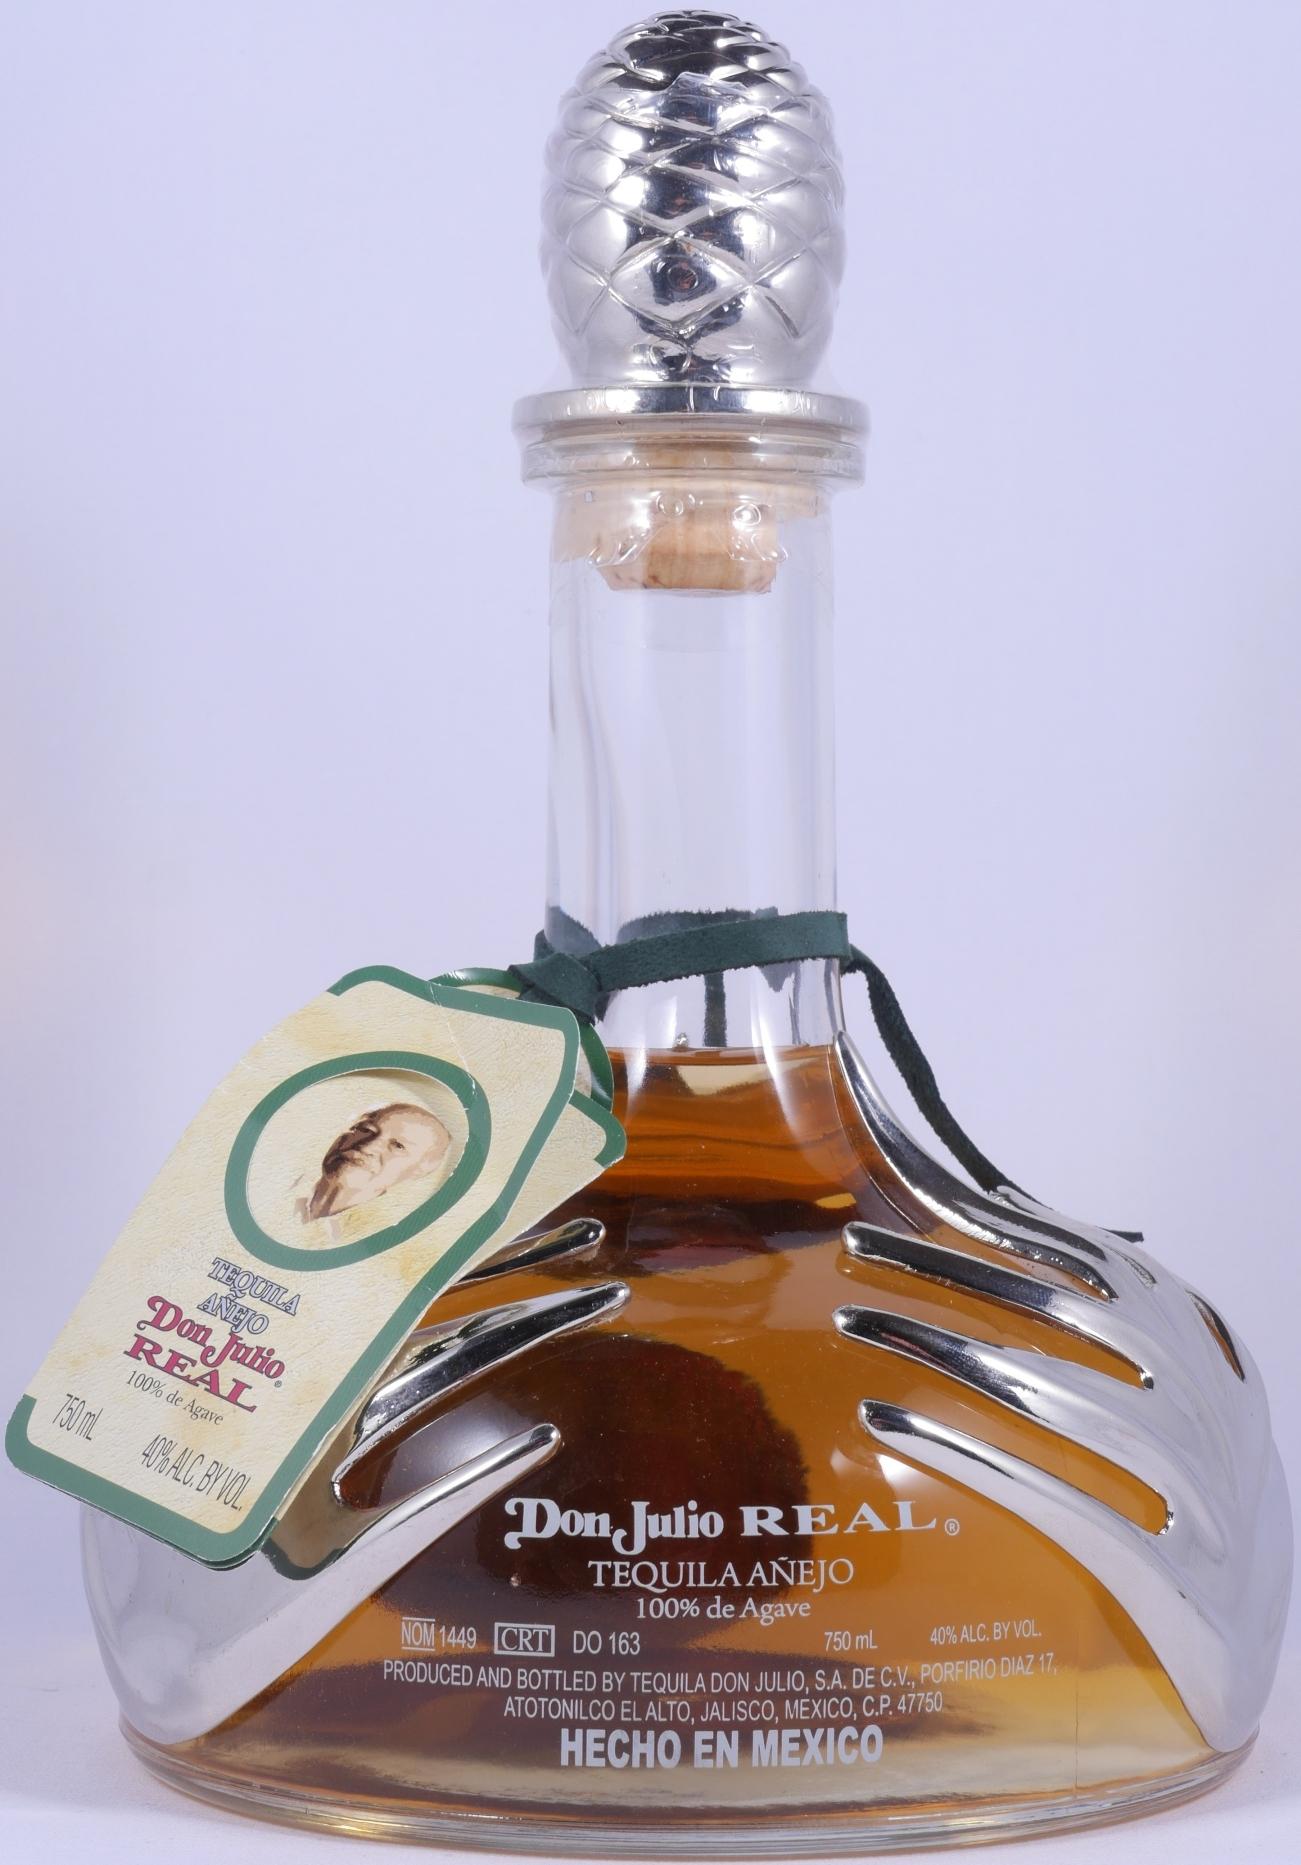 Don Julio Real Premium Extra Anejo Tequila 40 0 Vol Bei Amcom